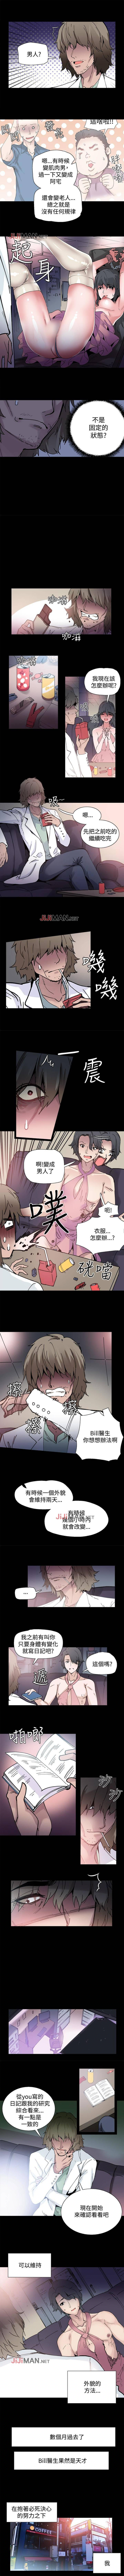 【已完结】Bodychange(作者:Seize & 死亡節奏) 第1~33话 13